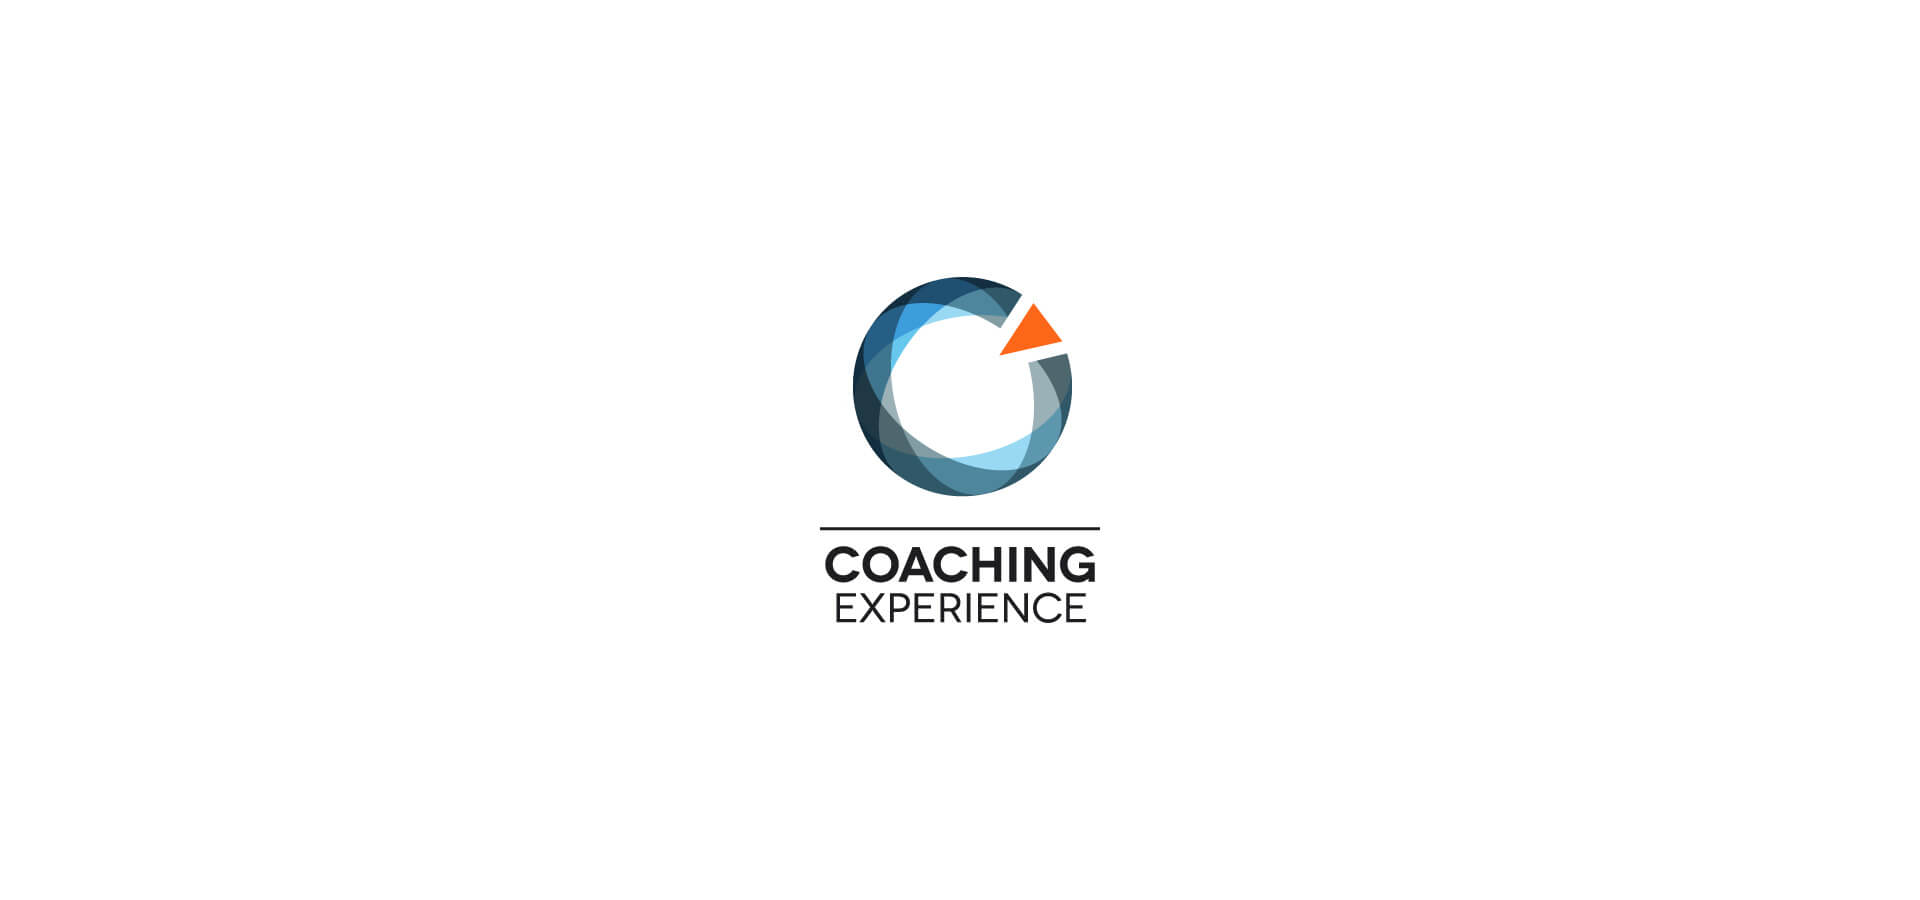 coachingexperience-logo